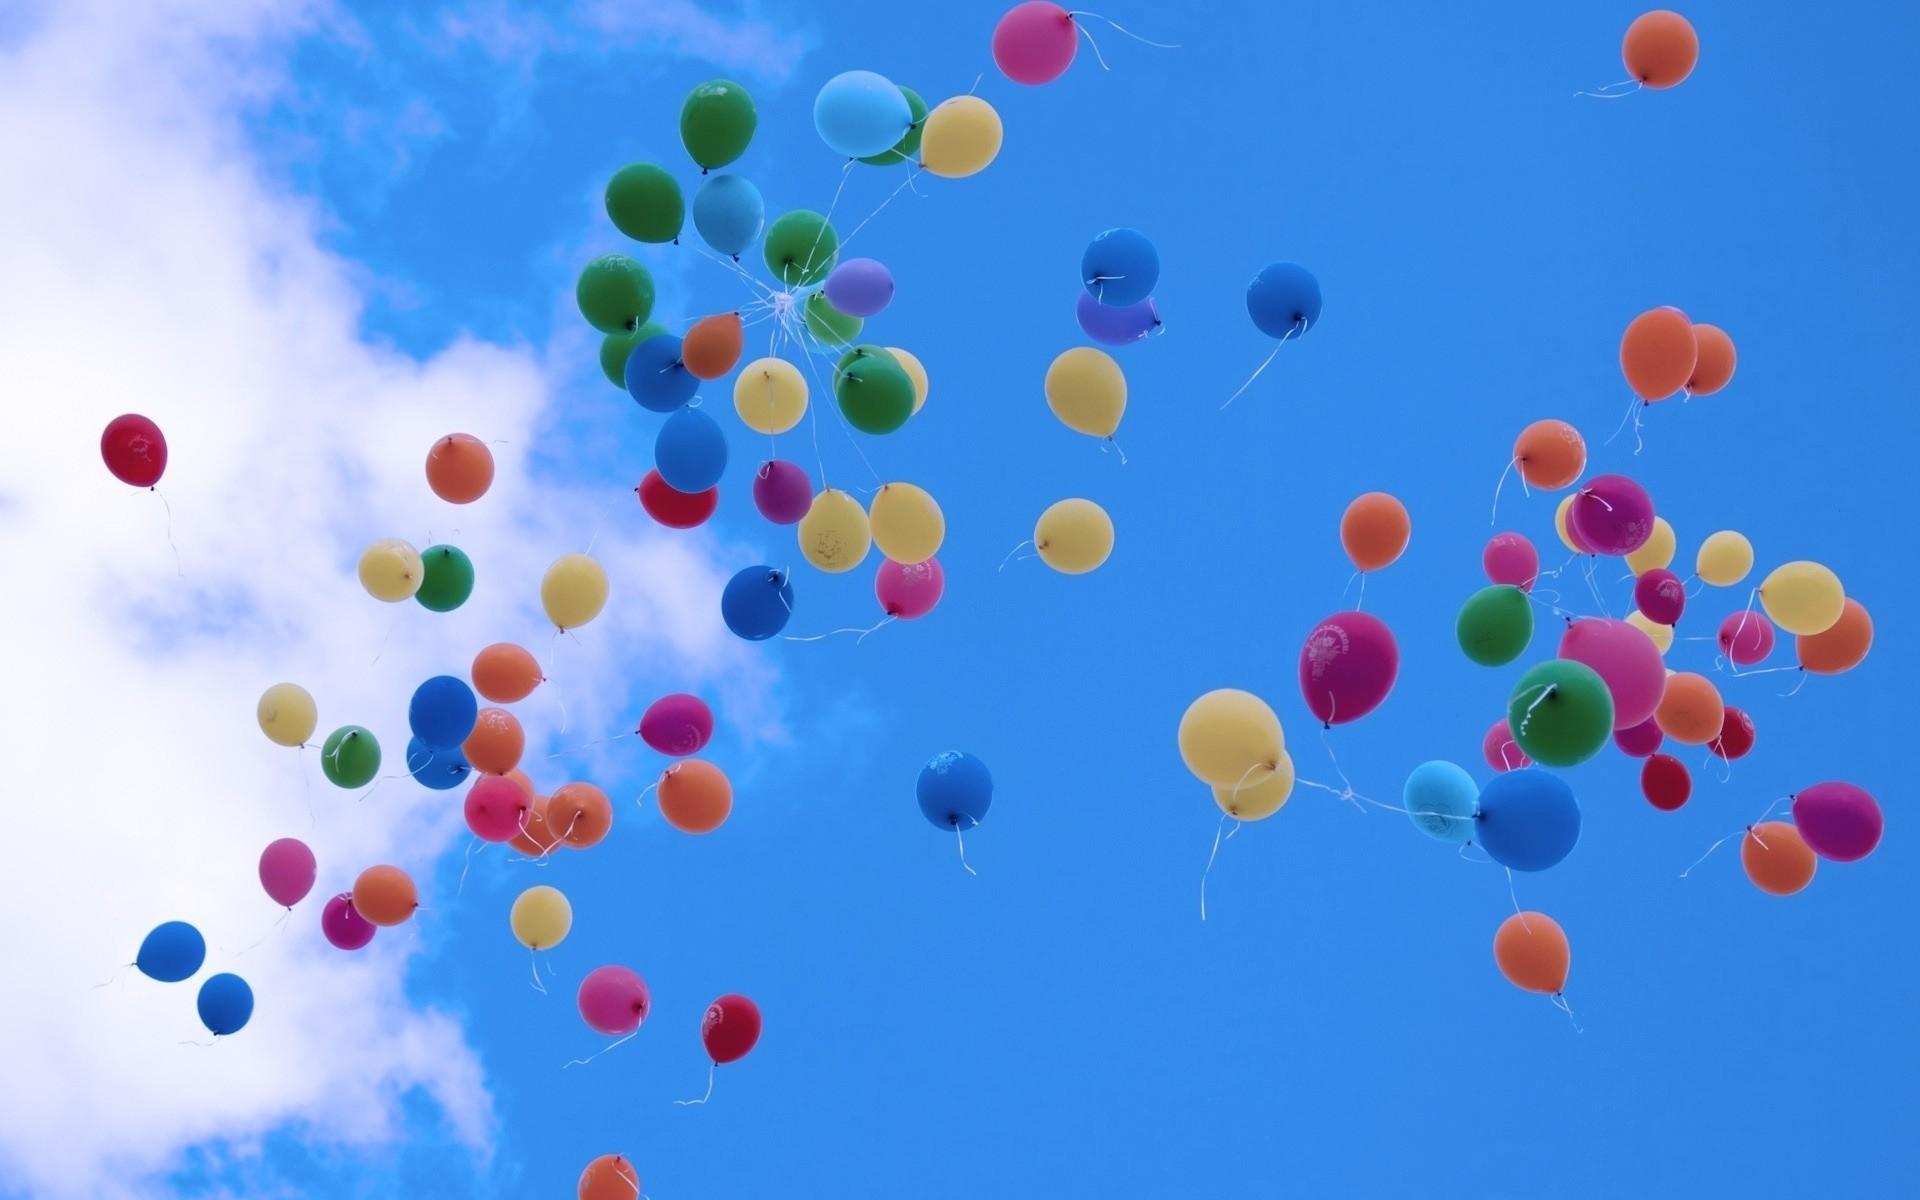 blue sky, sky, balloon, clouds